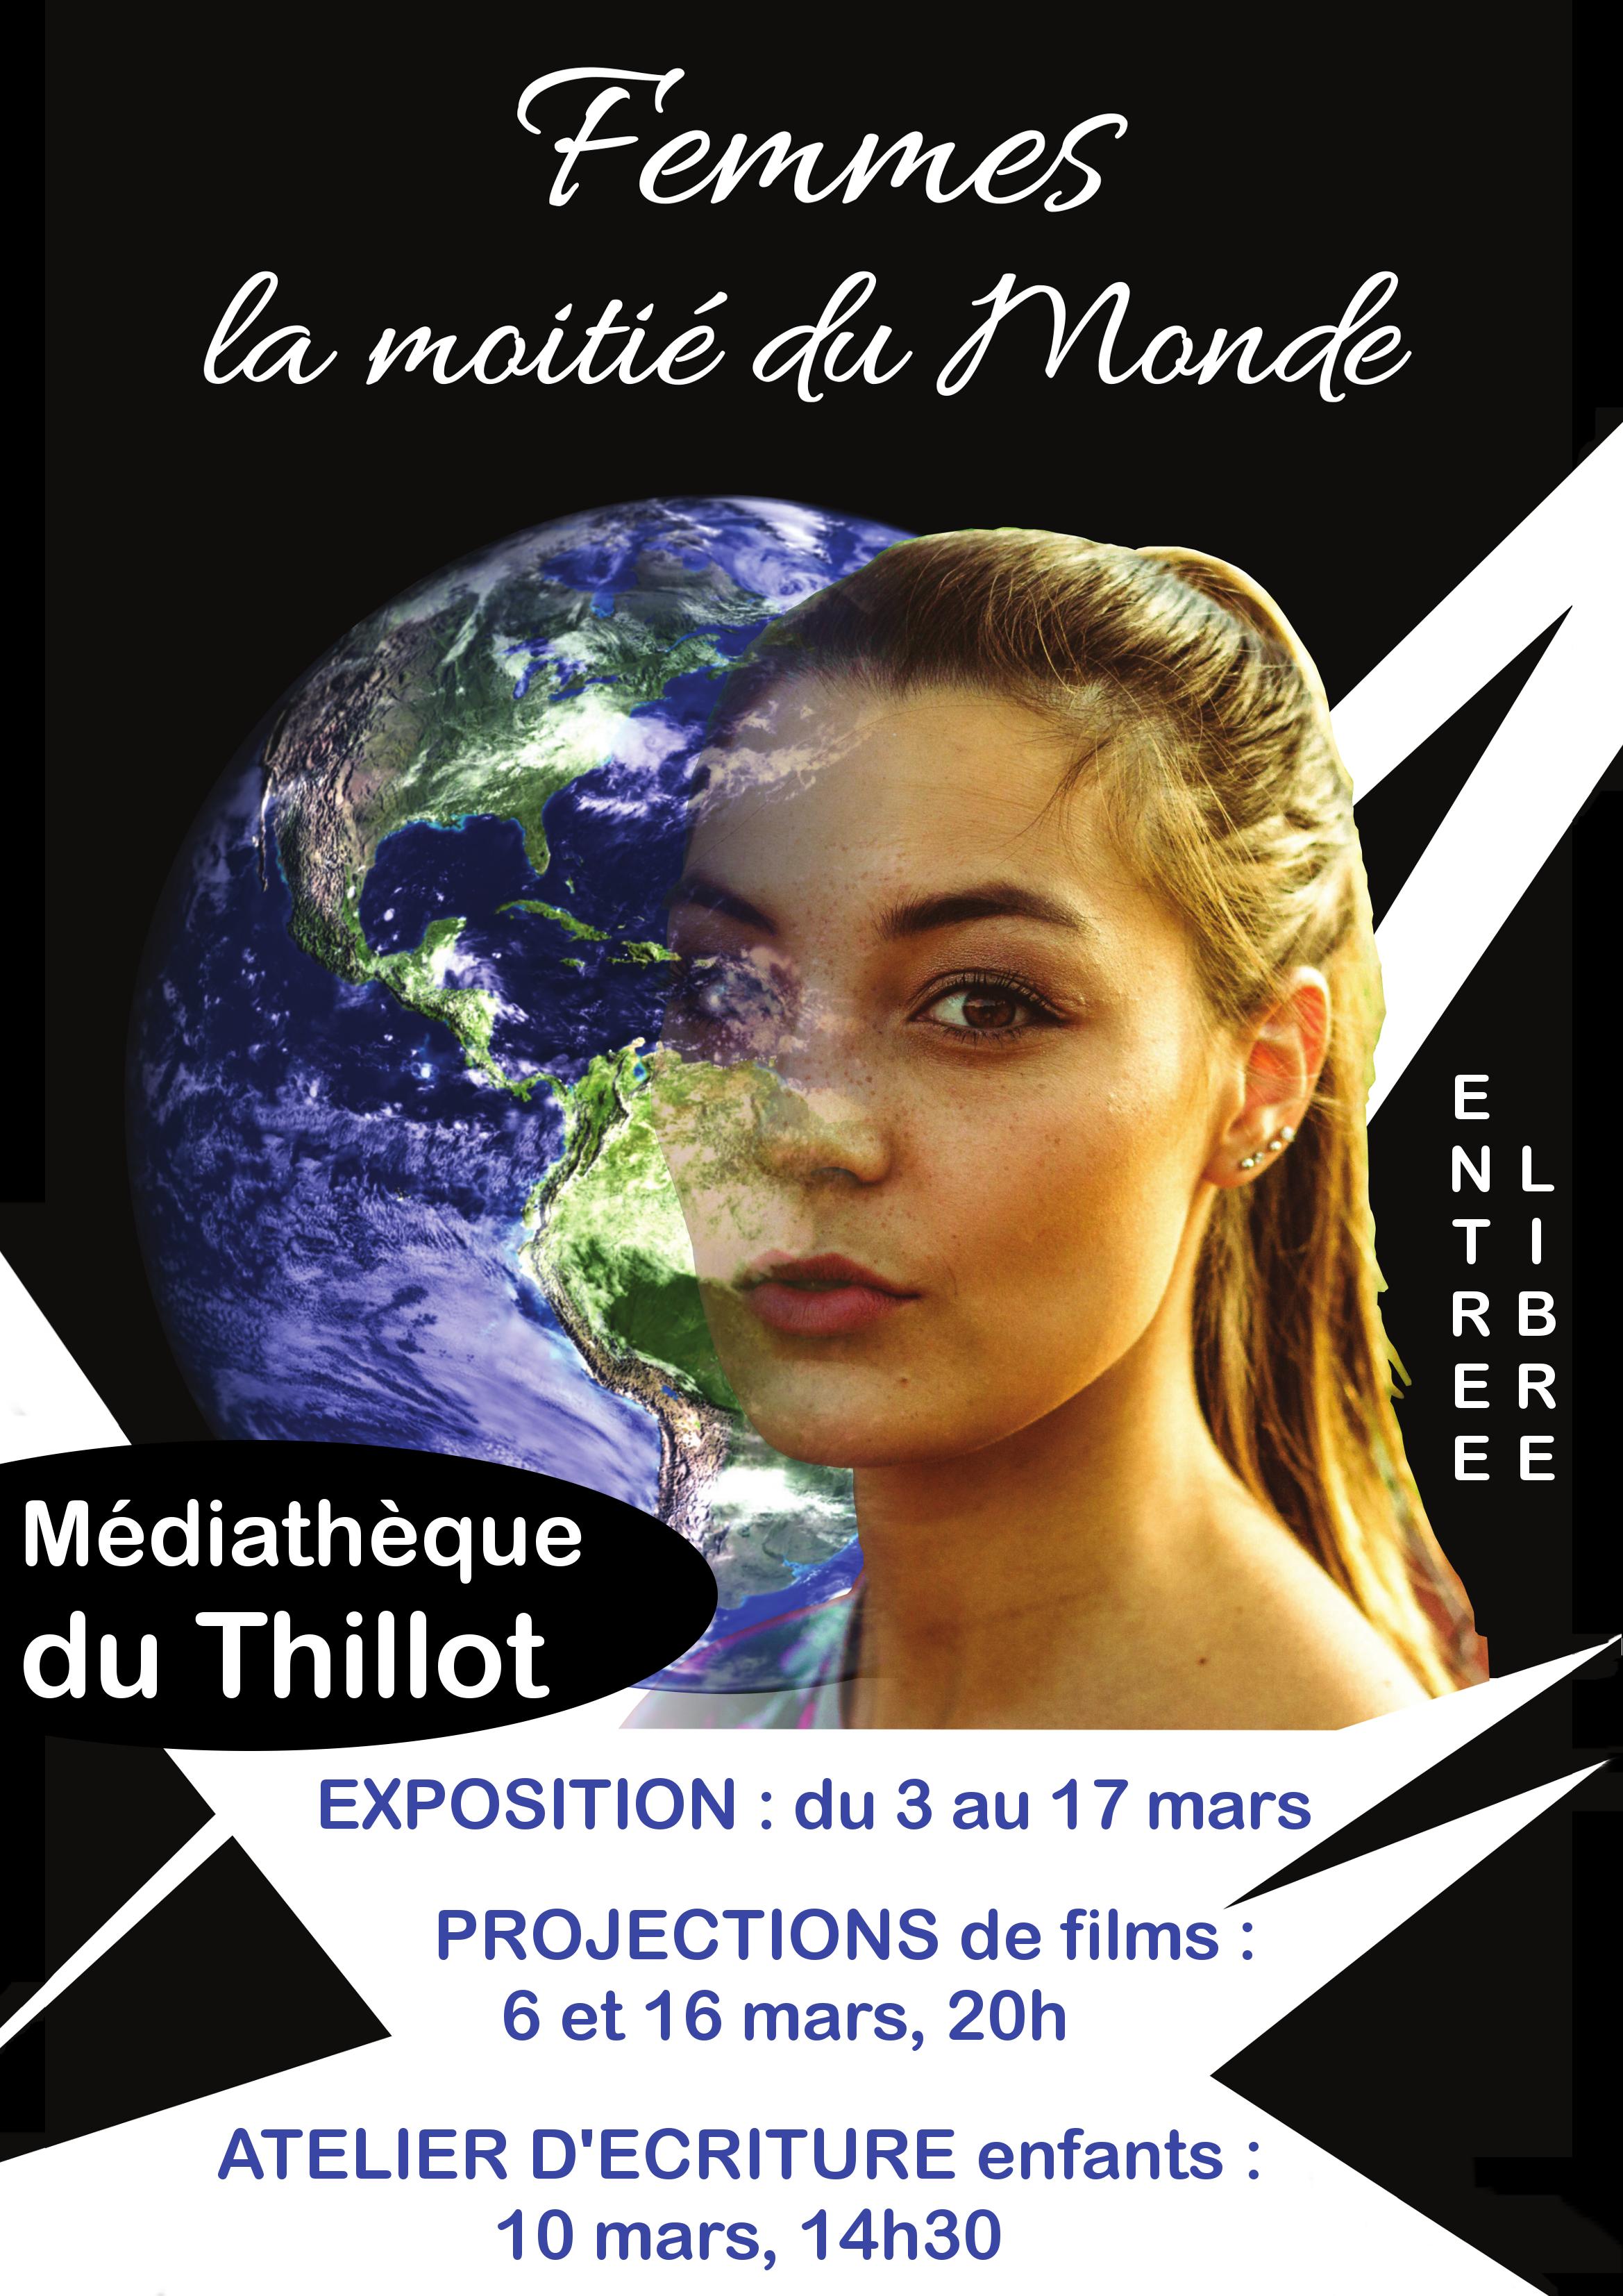 Affiche expo Femmes